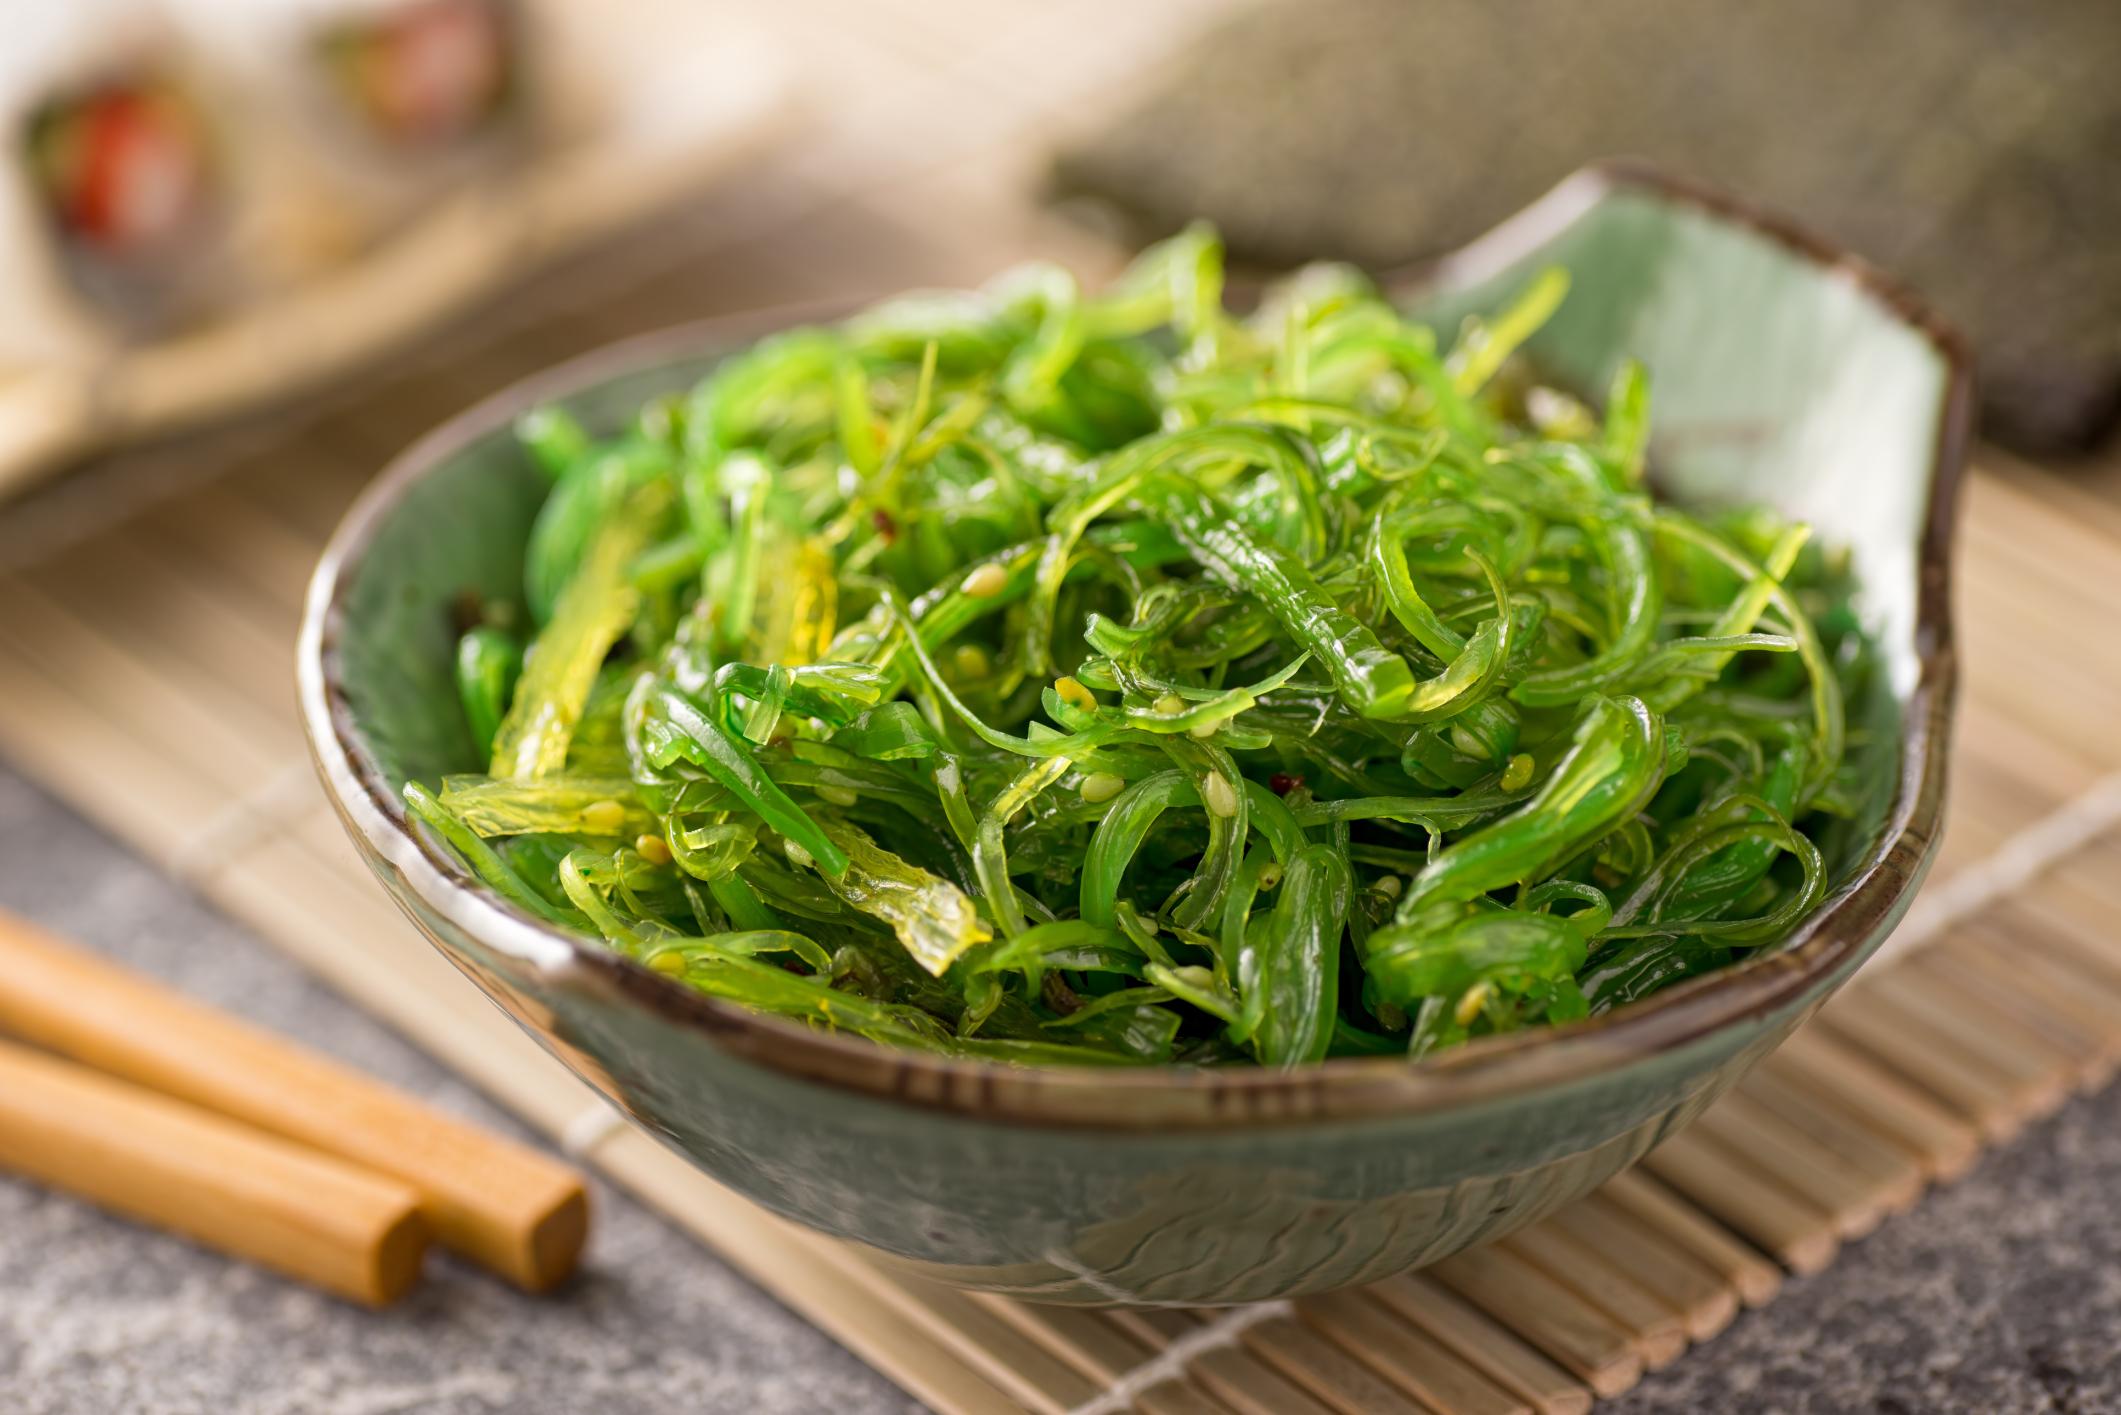 Health seaweed